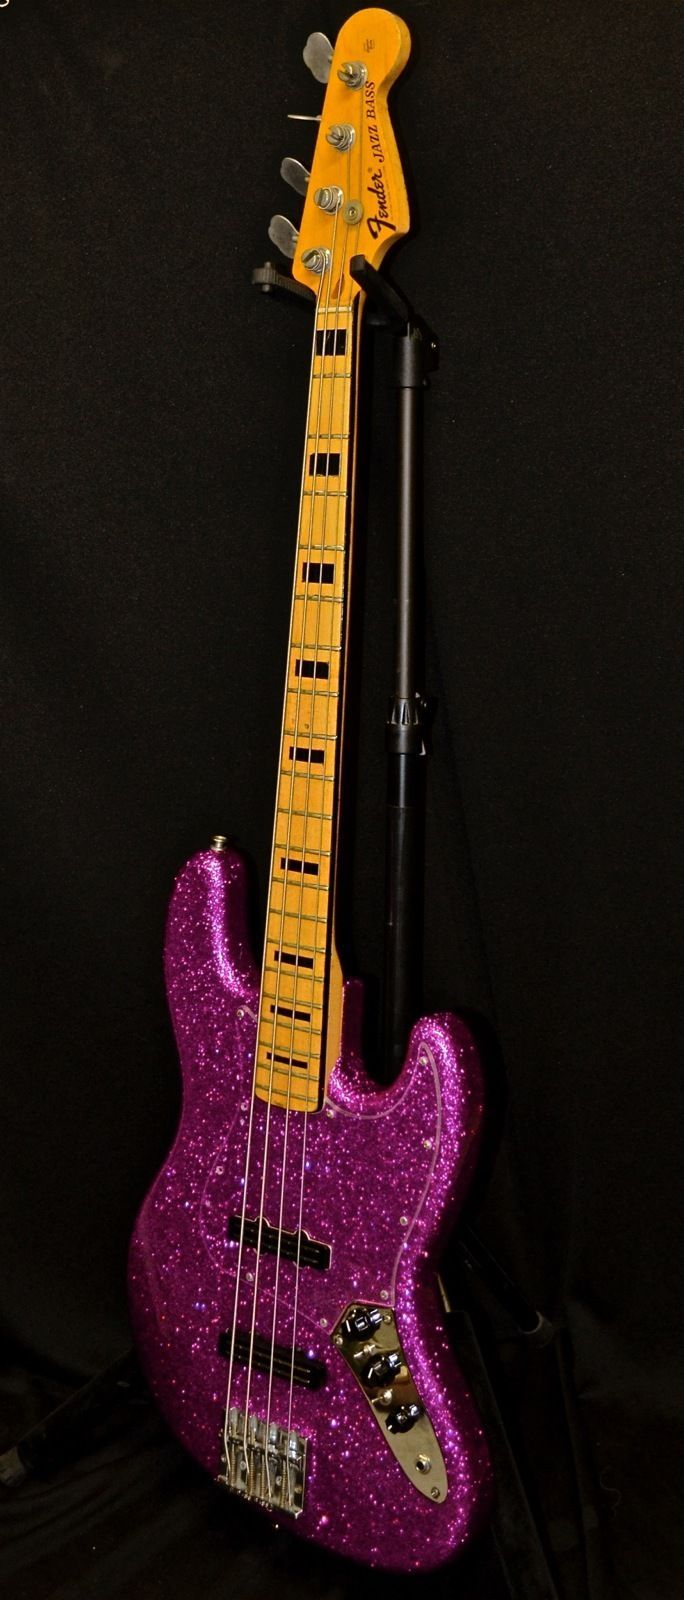 Vintage 1973 Fender Jazz Bass Neck Warmoth Body Joe Barden Pickups Custom Build | eBay